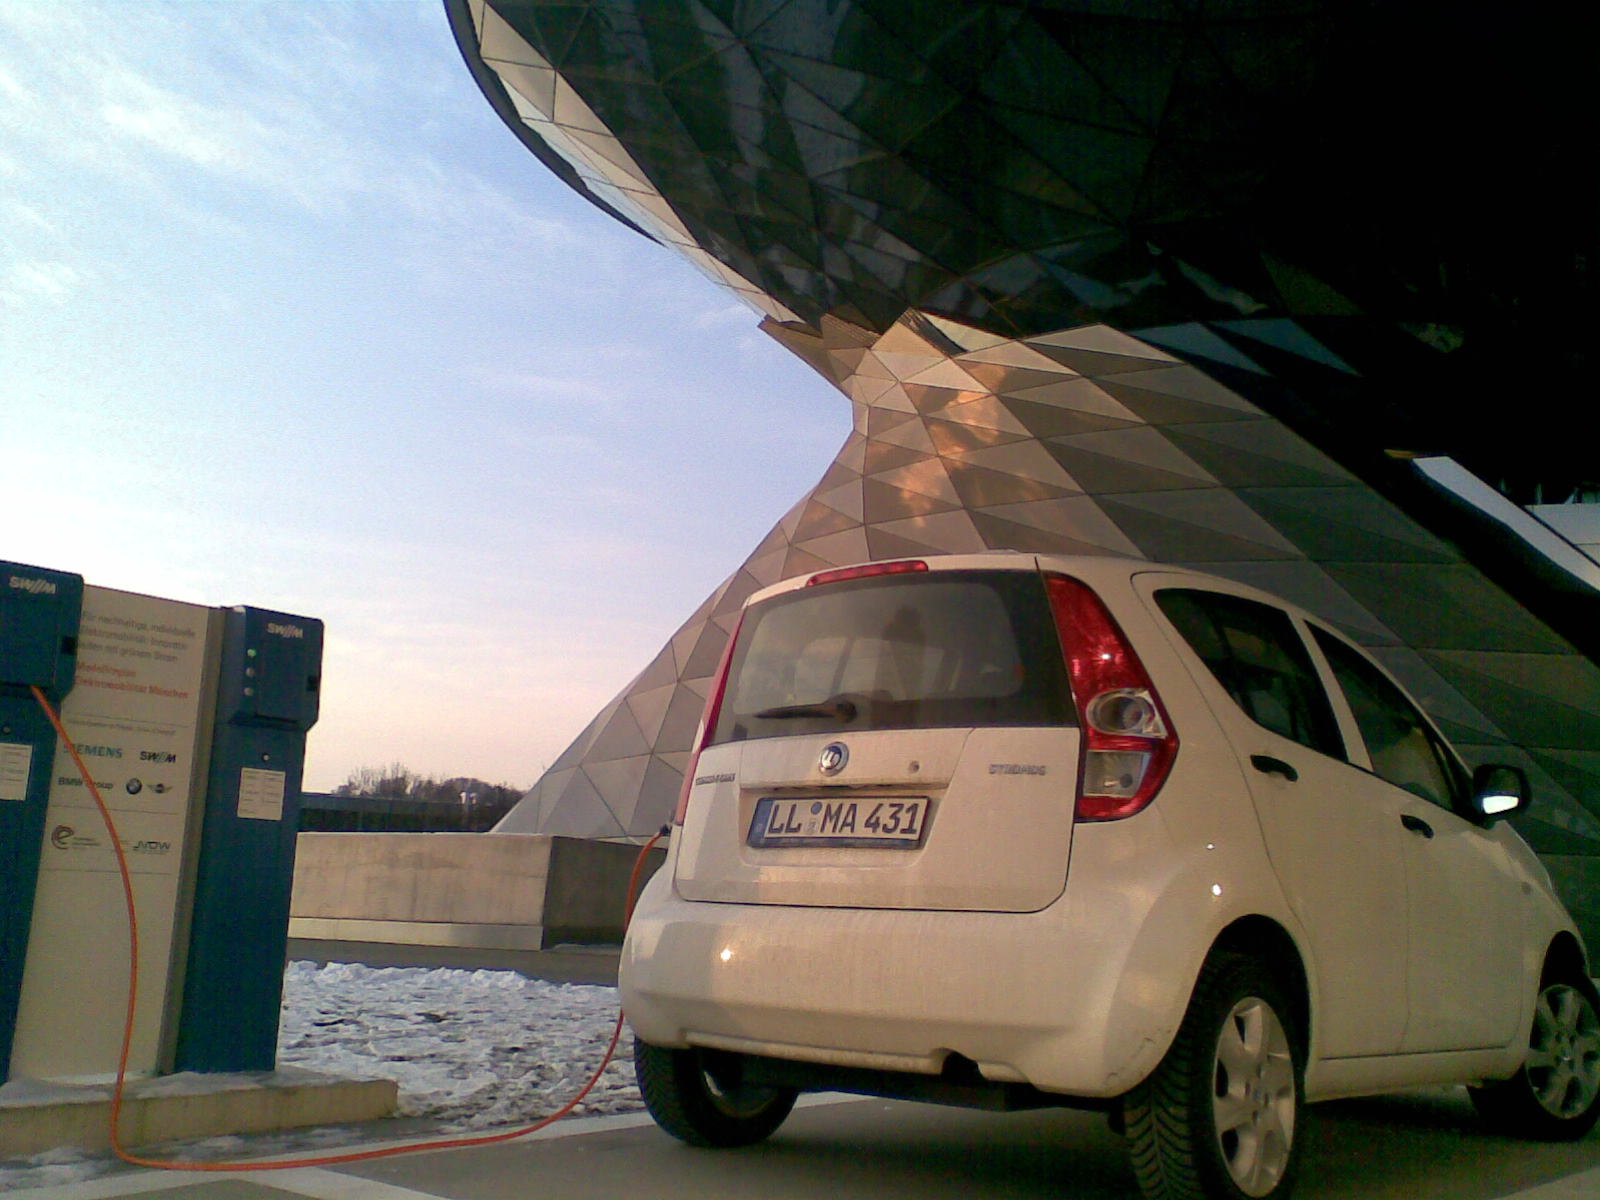 Stromos Fahrzeug von emma car